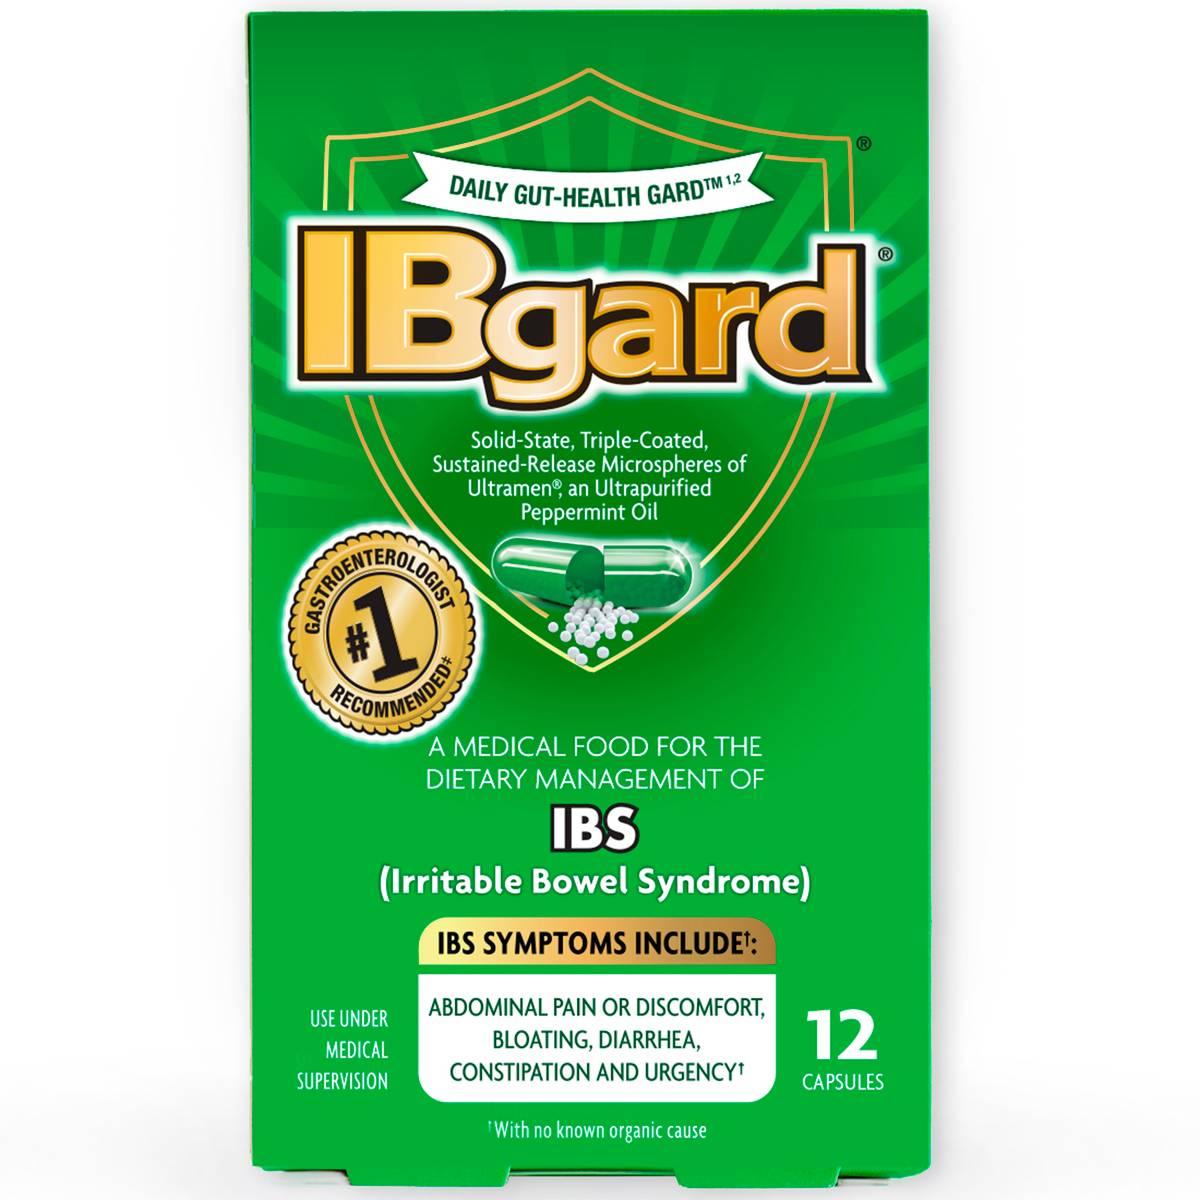 IBgard 12 capsules product